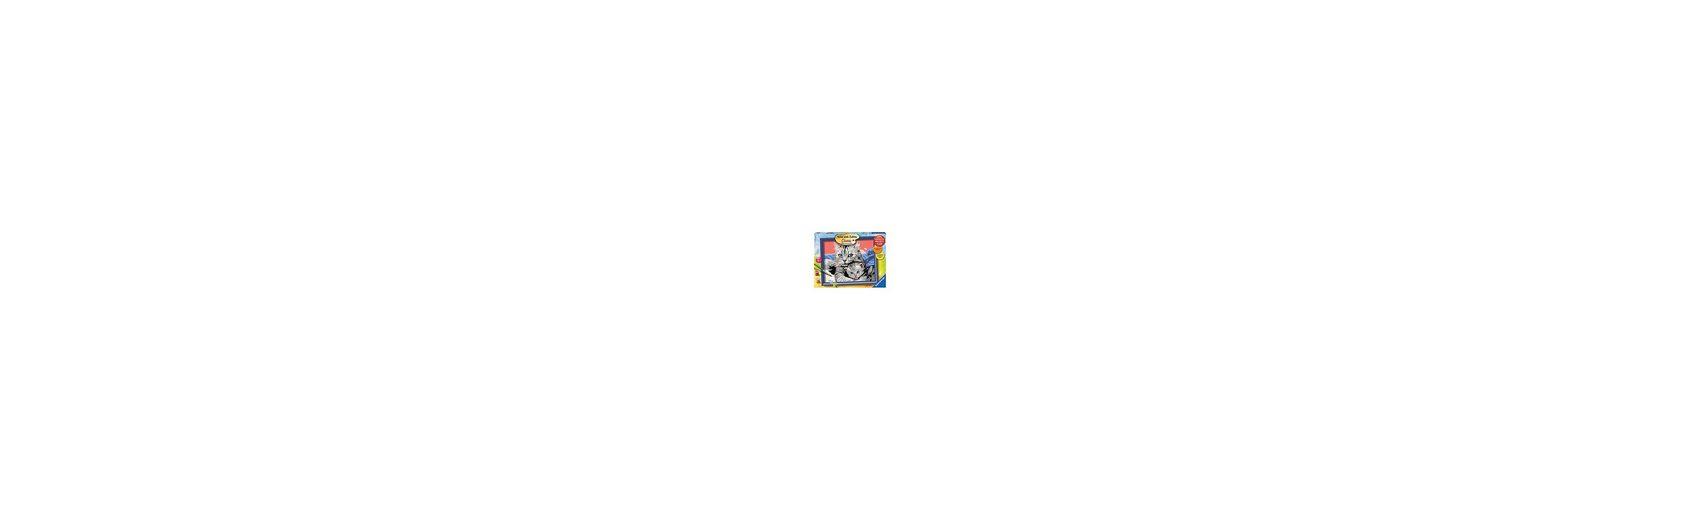 Ravensburger Malen nach Zahlen Serie C - Katzenliebe, 24x30 cm